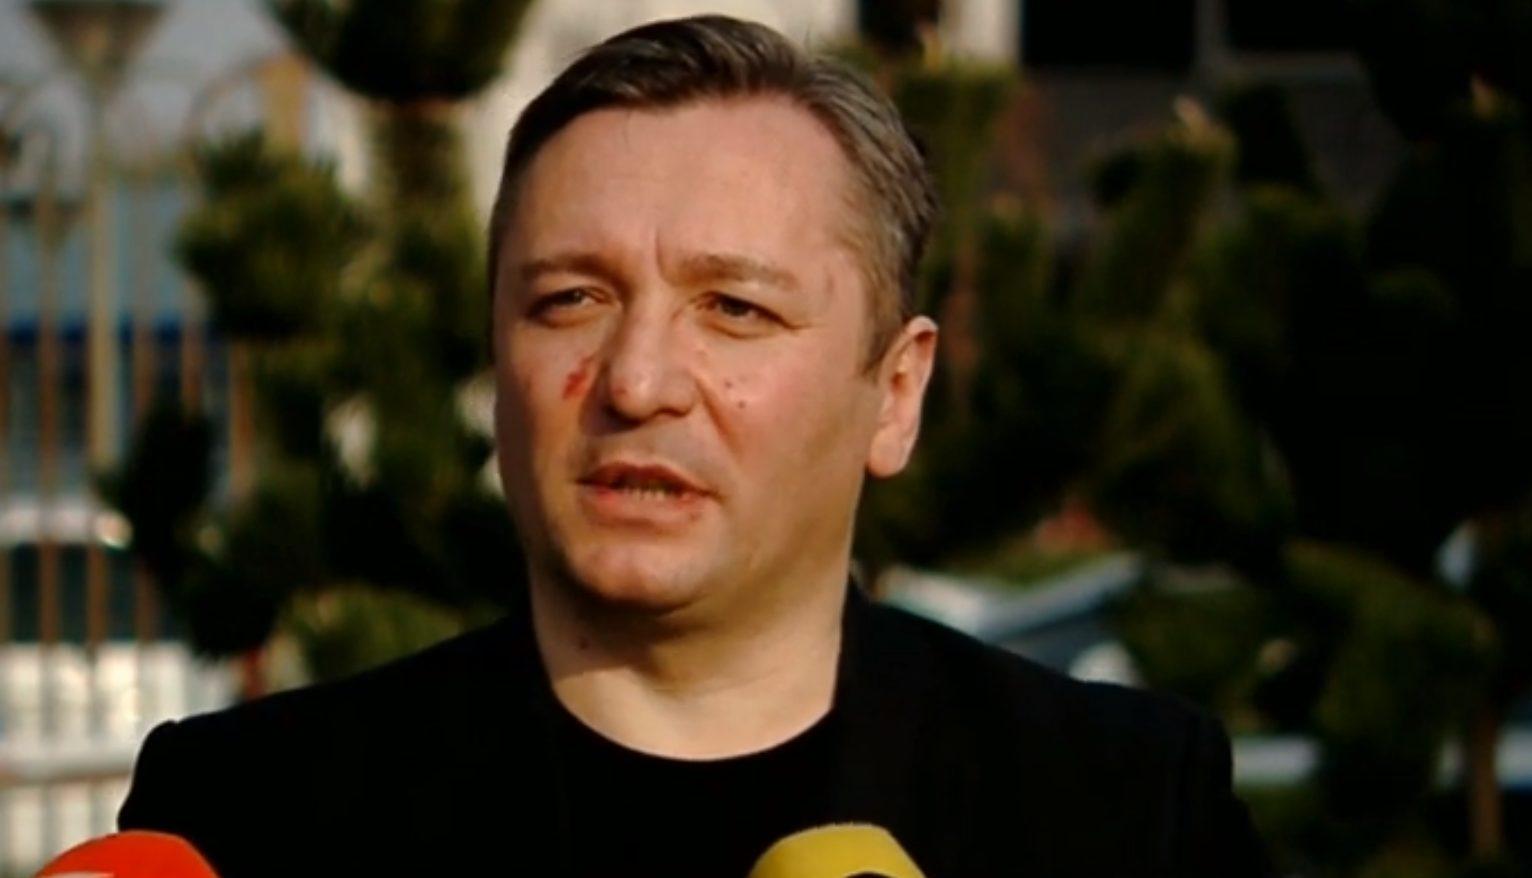 Vladimer Bedukadze тюремный скандал тюремный скандал